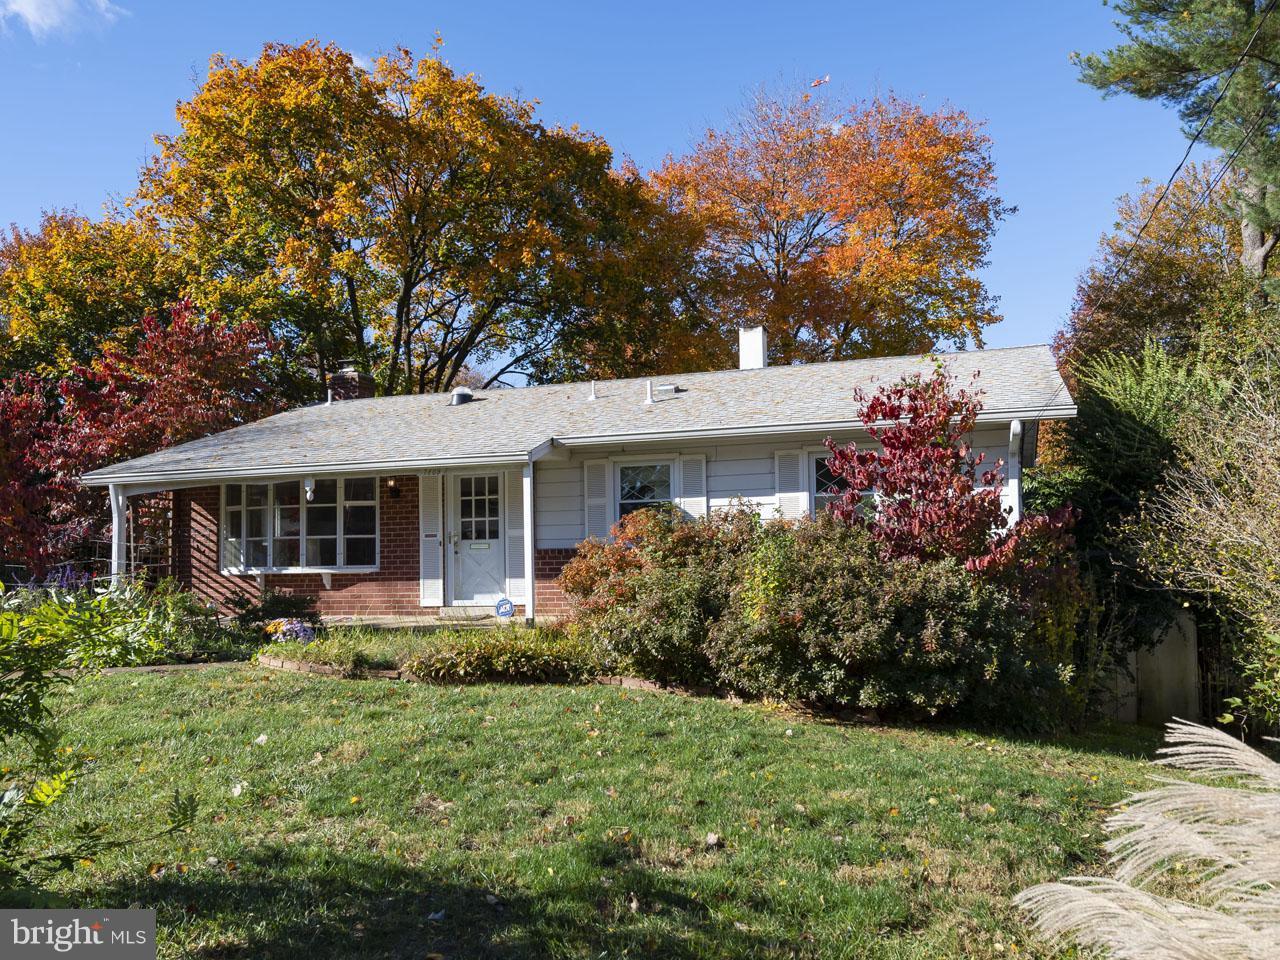 VAFX101488-300978887900-2021-09-05-13-51-03  |   | Annandale Delaware Real Estate For Sale | MLS# Vafx101488  - Best of Northern Virginia